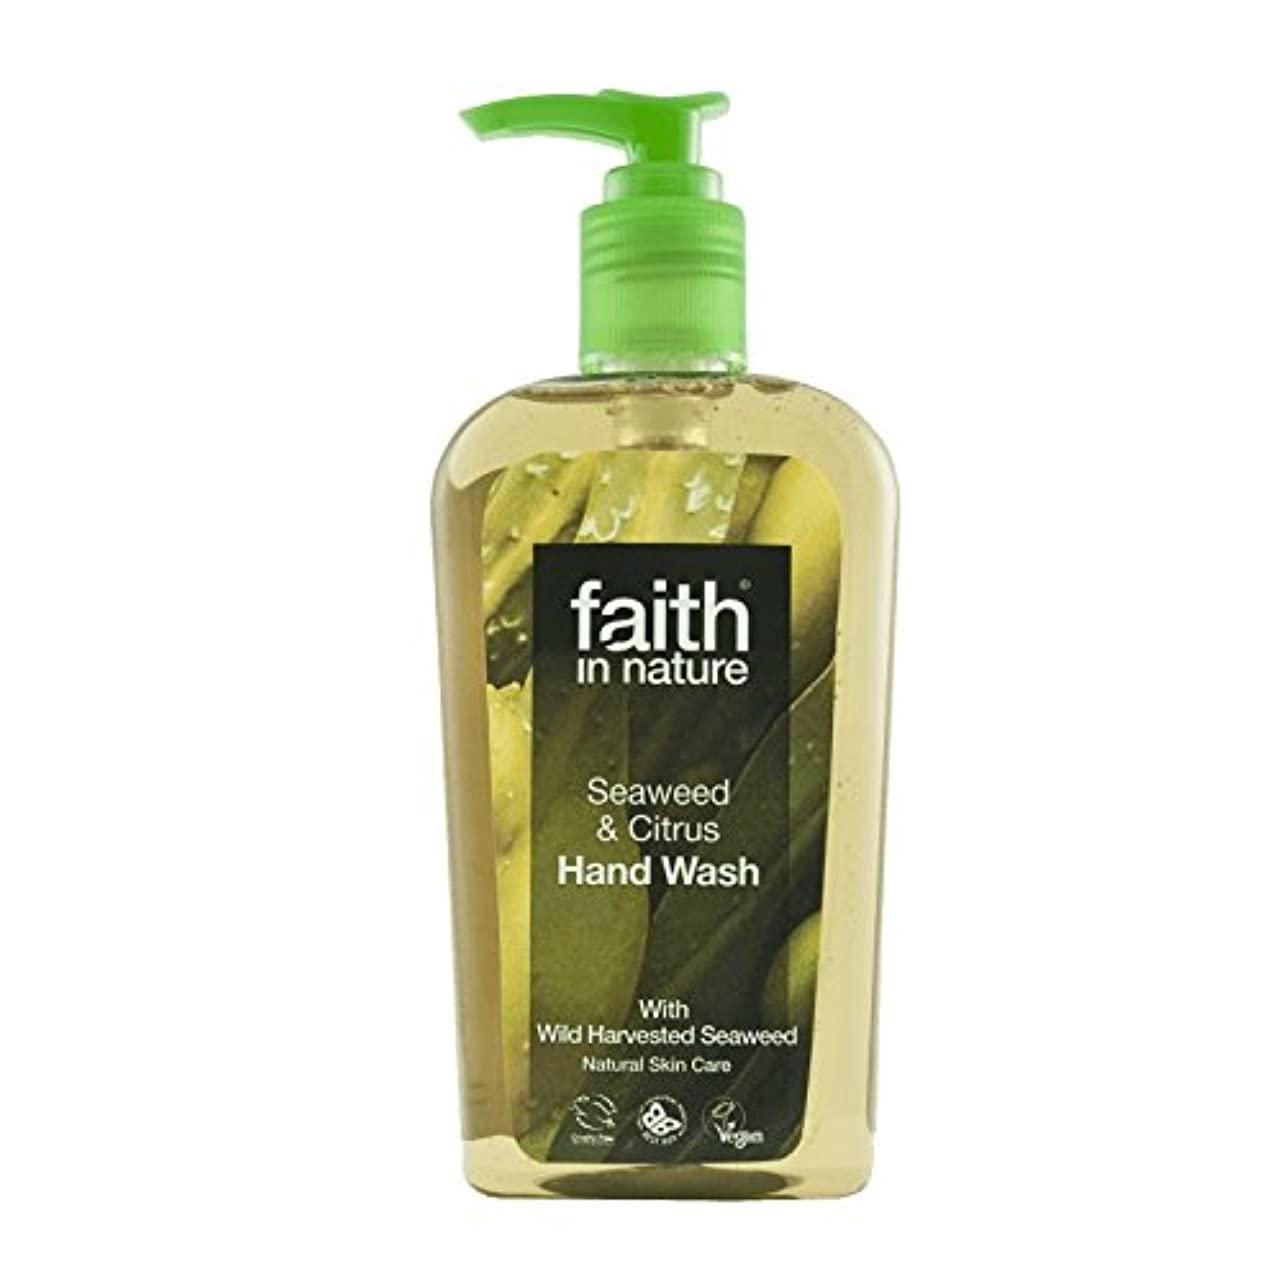 Faith In Nature Seaweed Handwash 300ml (Pack of 2) - 自然海藻手洗いの300ミリリットルの信仰 (x2) [並行輸入品]